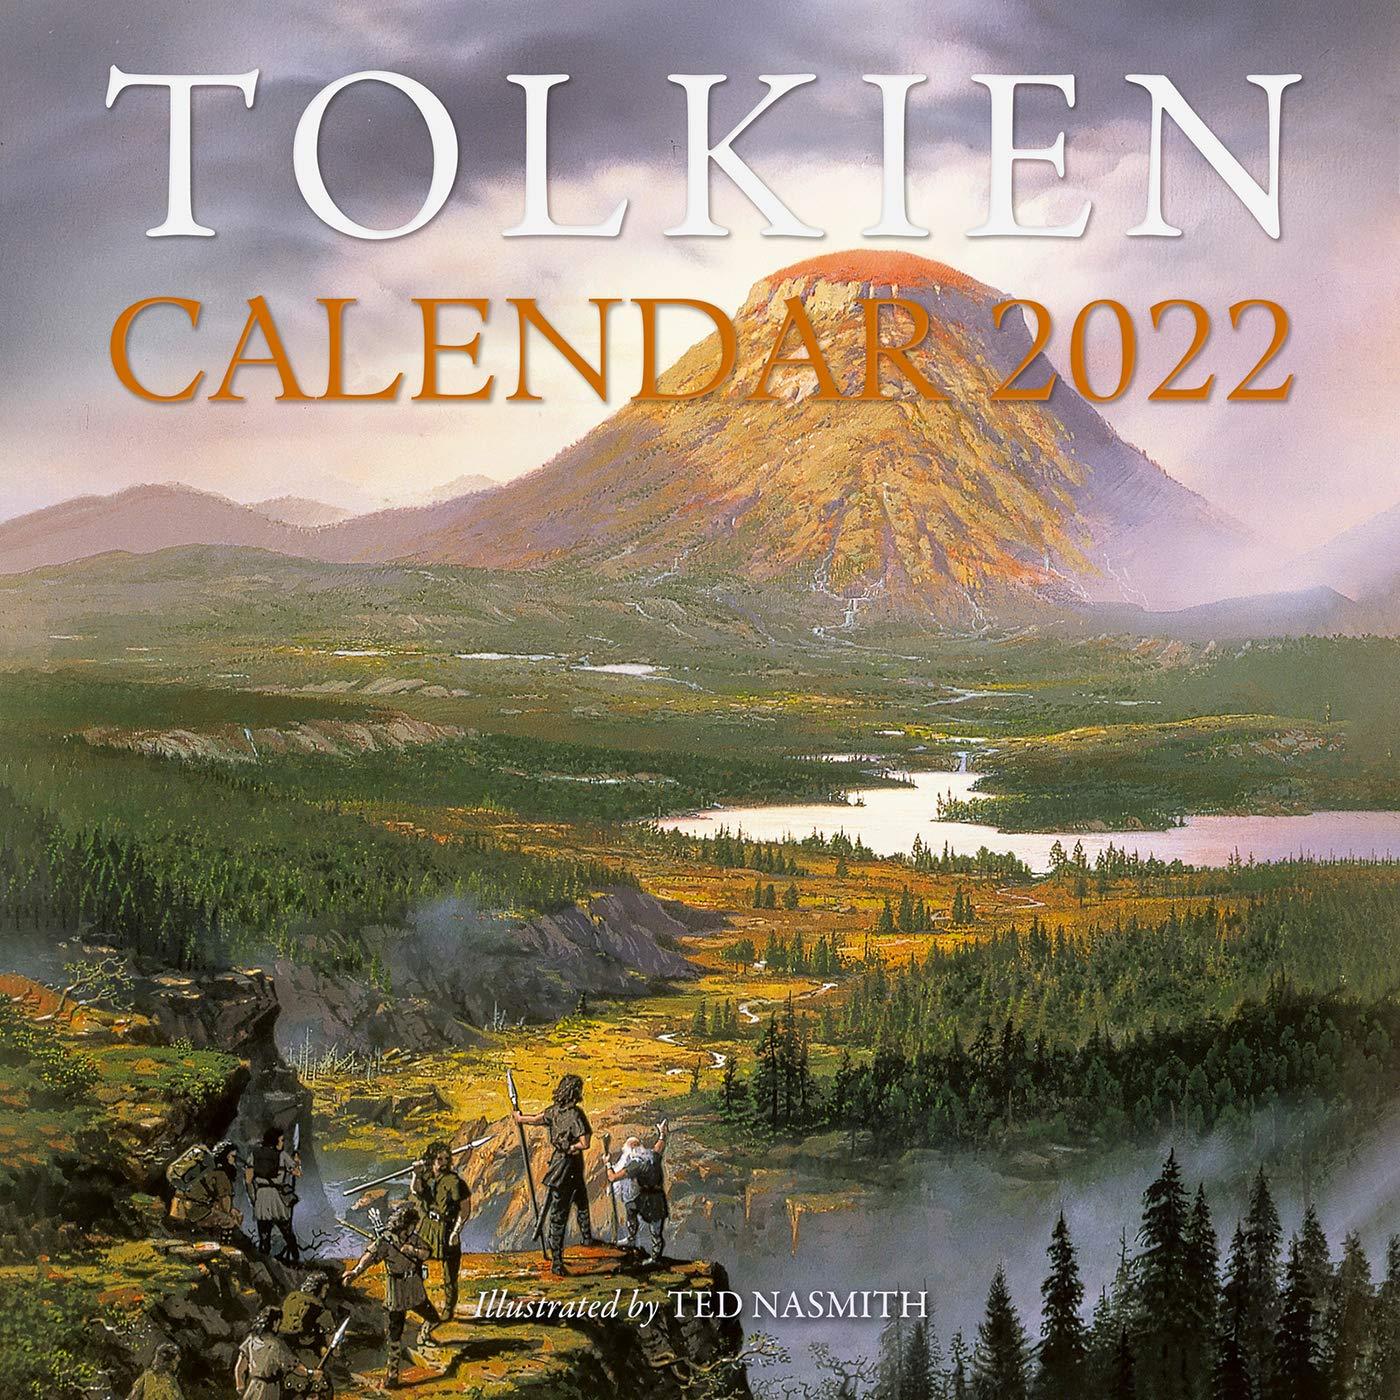 Tolkien Calendar 2022.Tolkien Calendar 2022 Tolkien J R R 9780063139732 Amazon Com Books